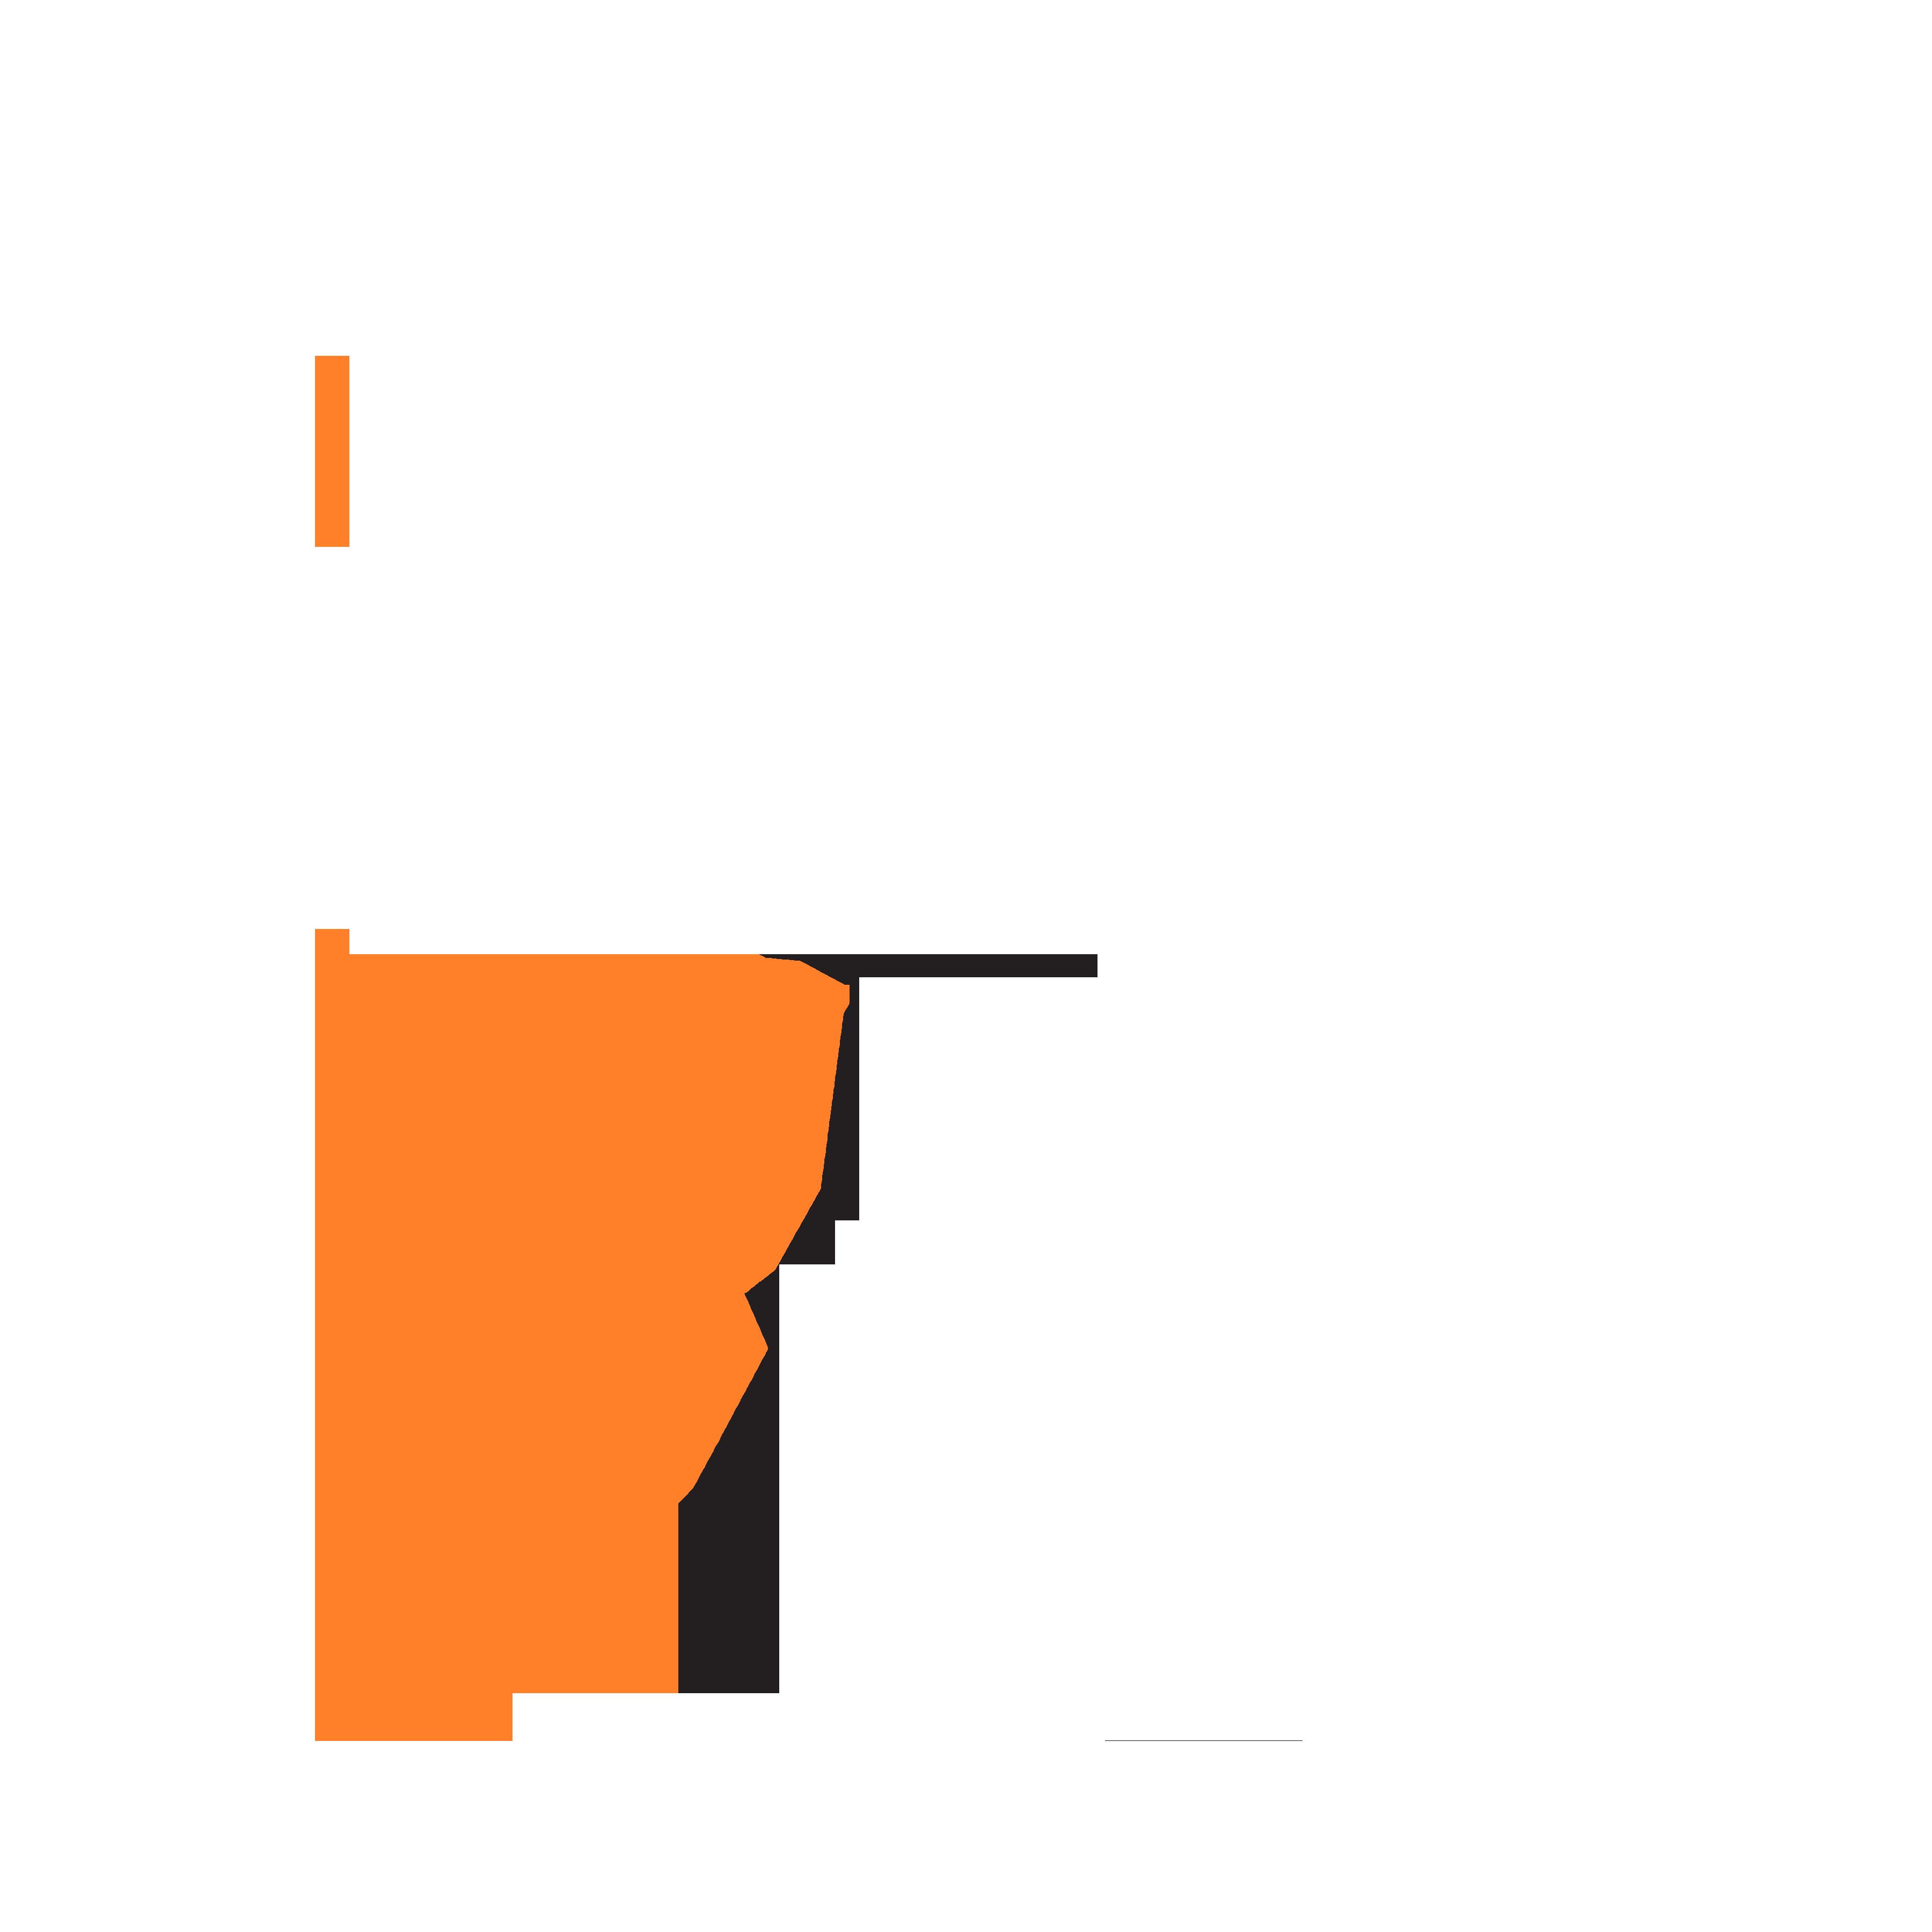 thefitlogo